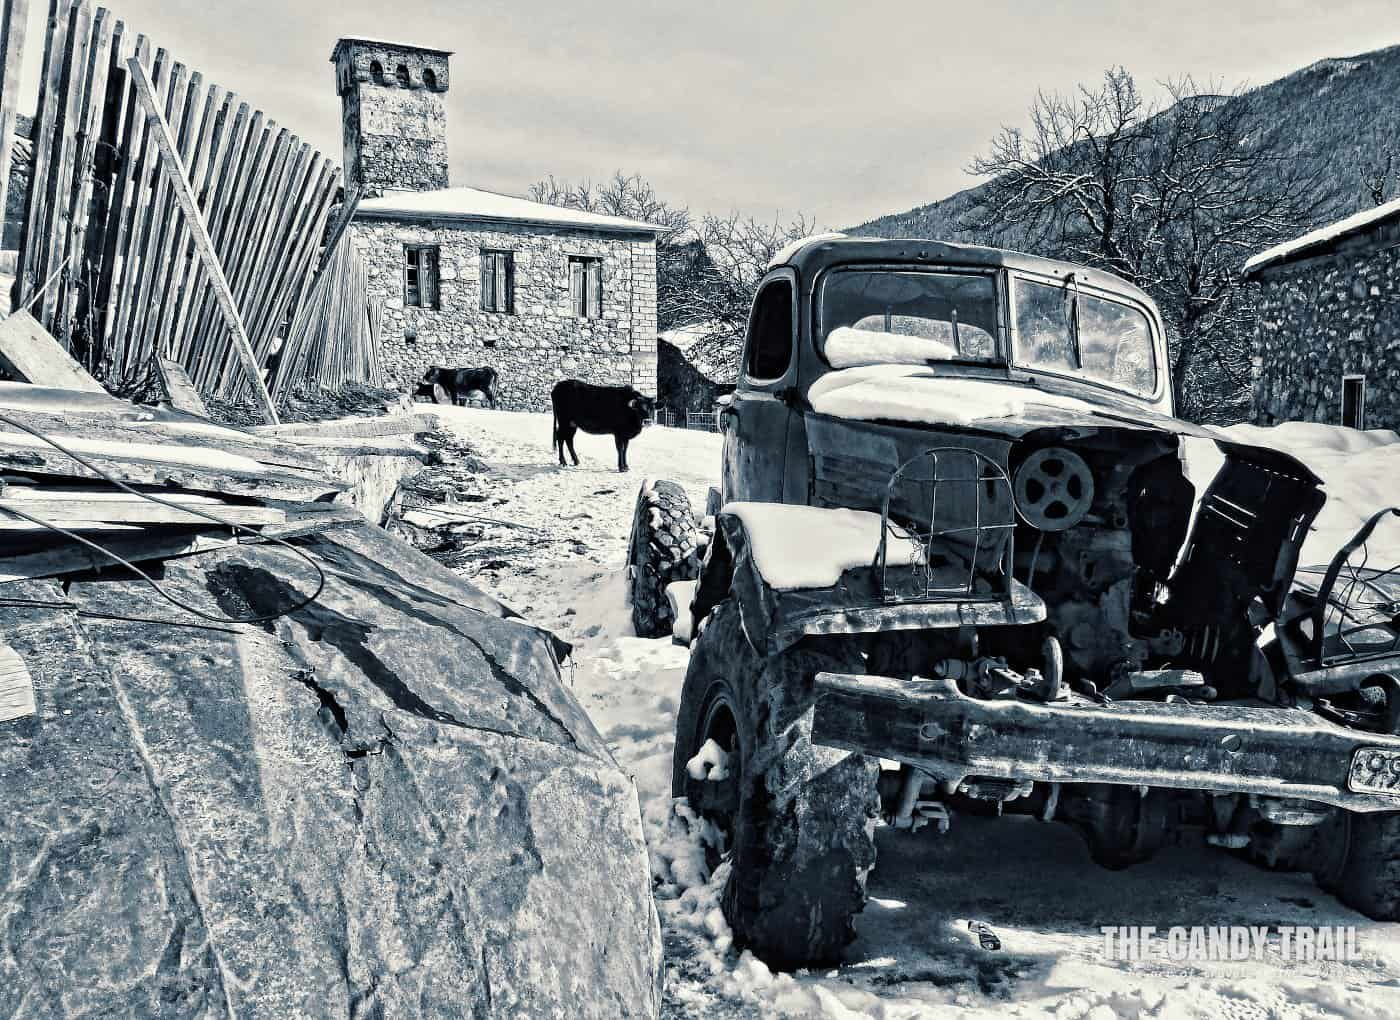 Wrecked Soviet truck in backstreets of Mestia in Winter.